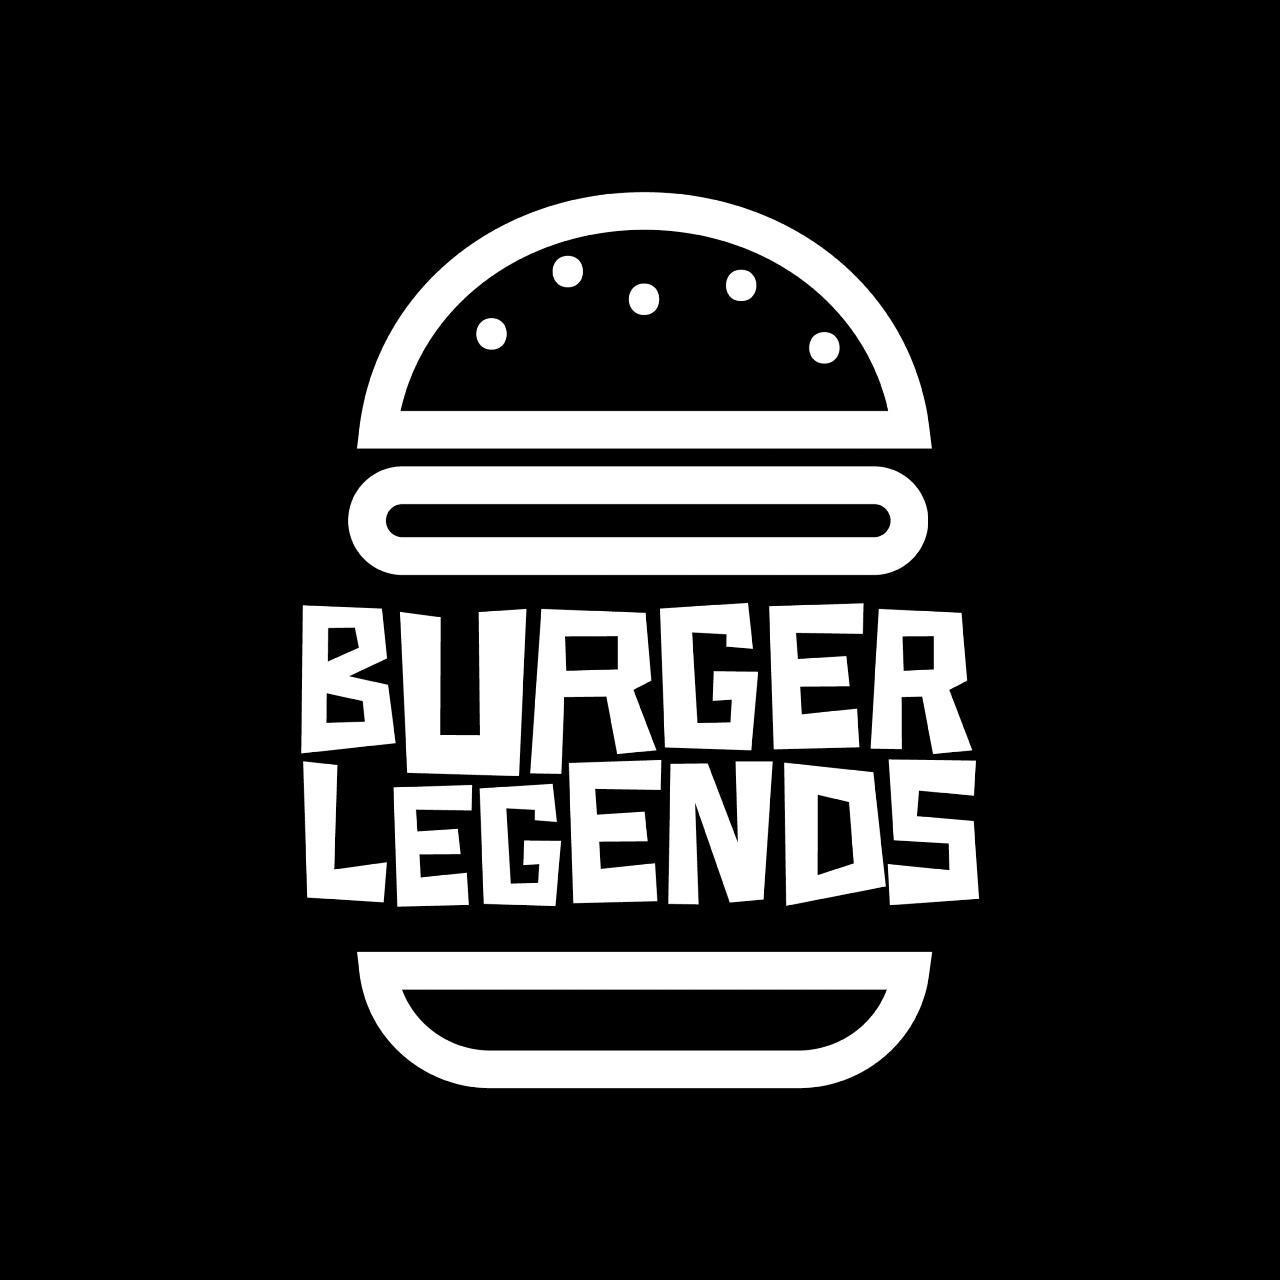 Burger legends לוגו